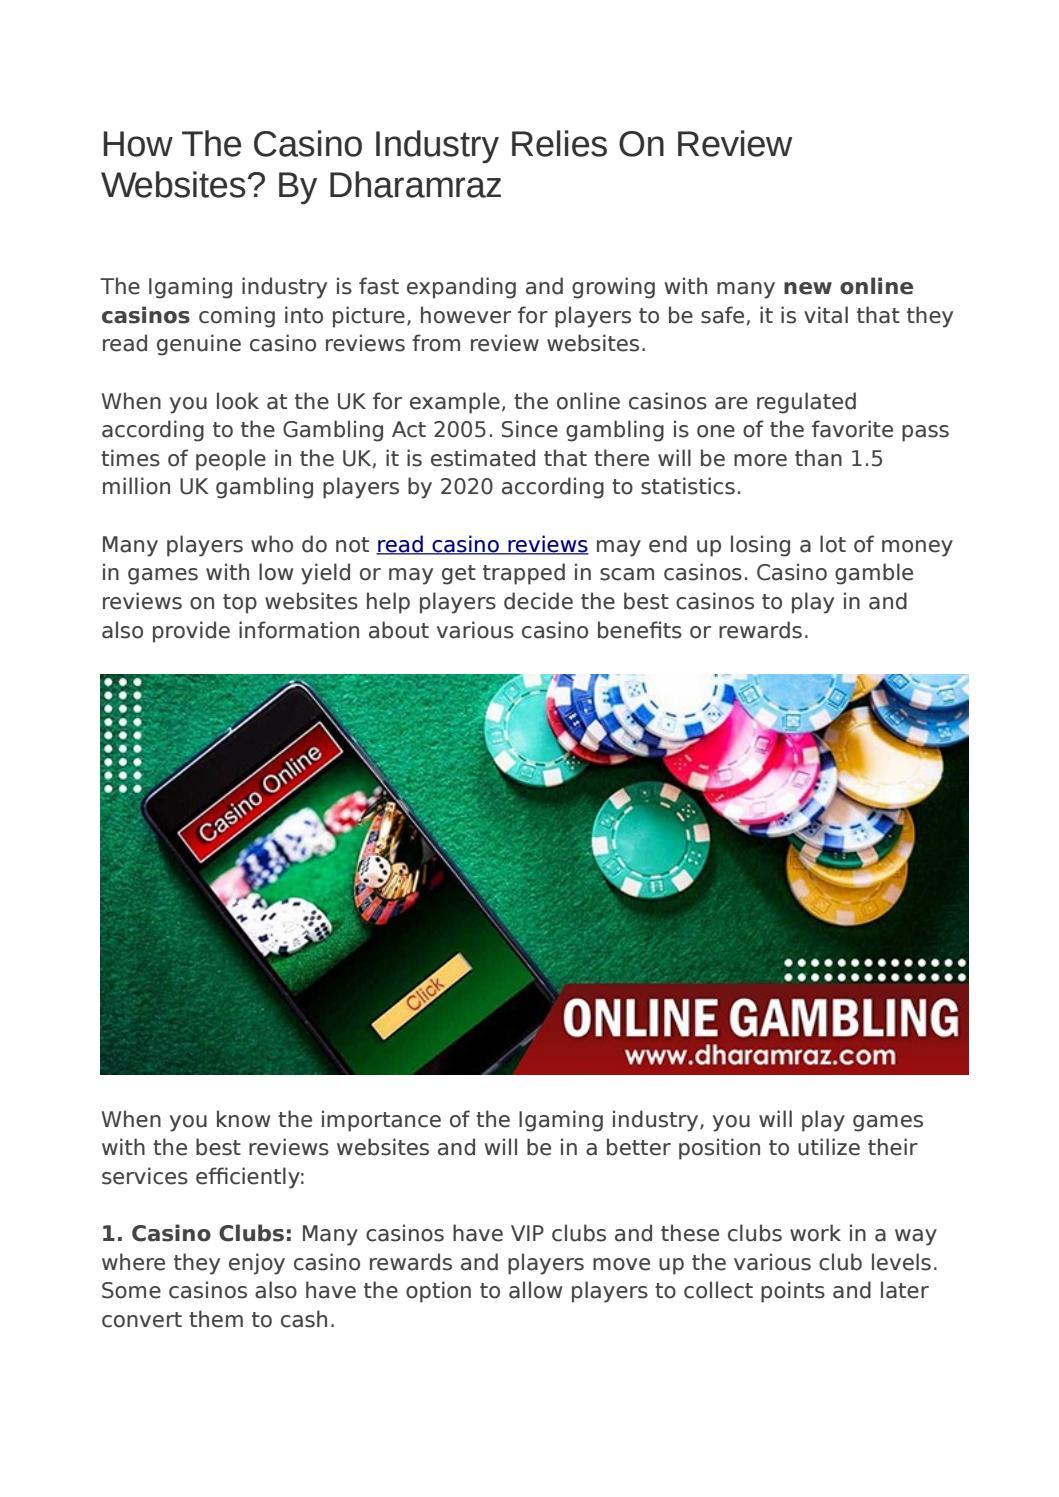 Best Online Casino Review Website Dharamraz By Freya 23 Issuu